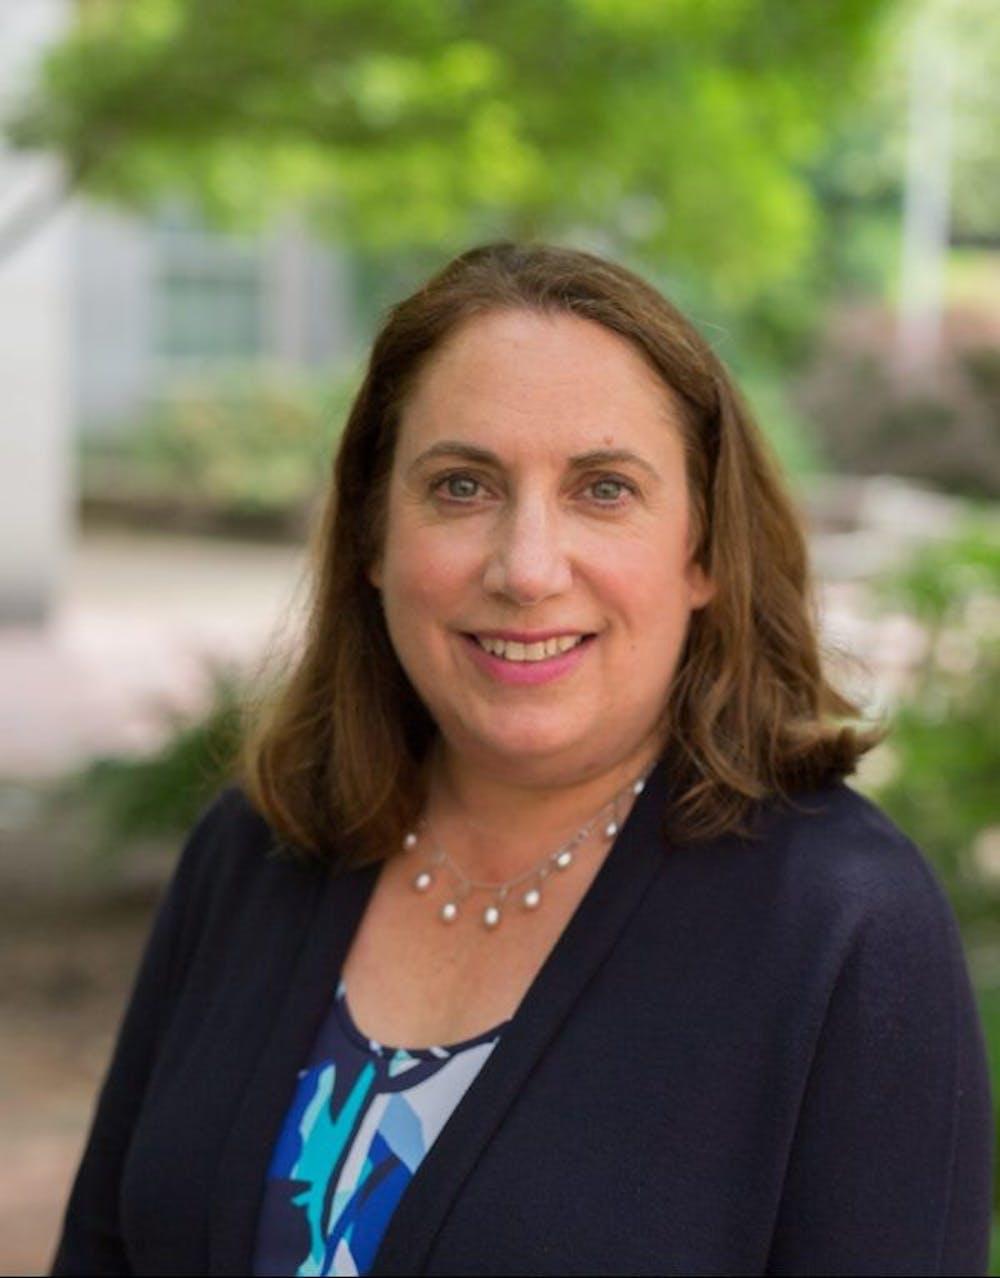 UNC faculty member selected for prestigious O. Max Gardner Award